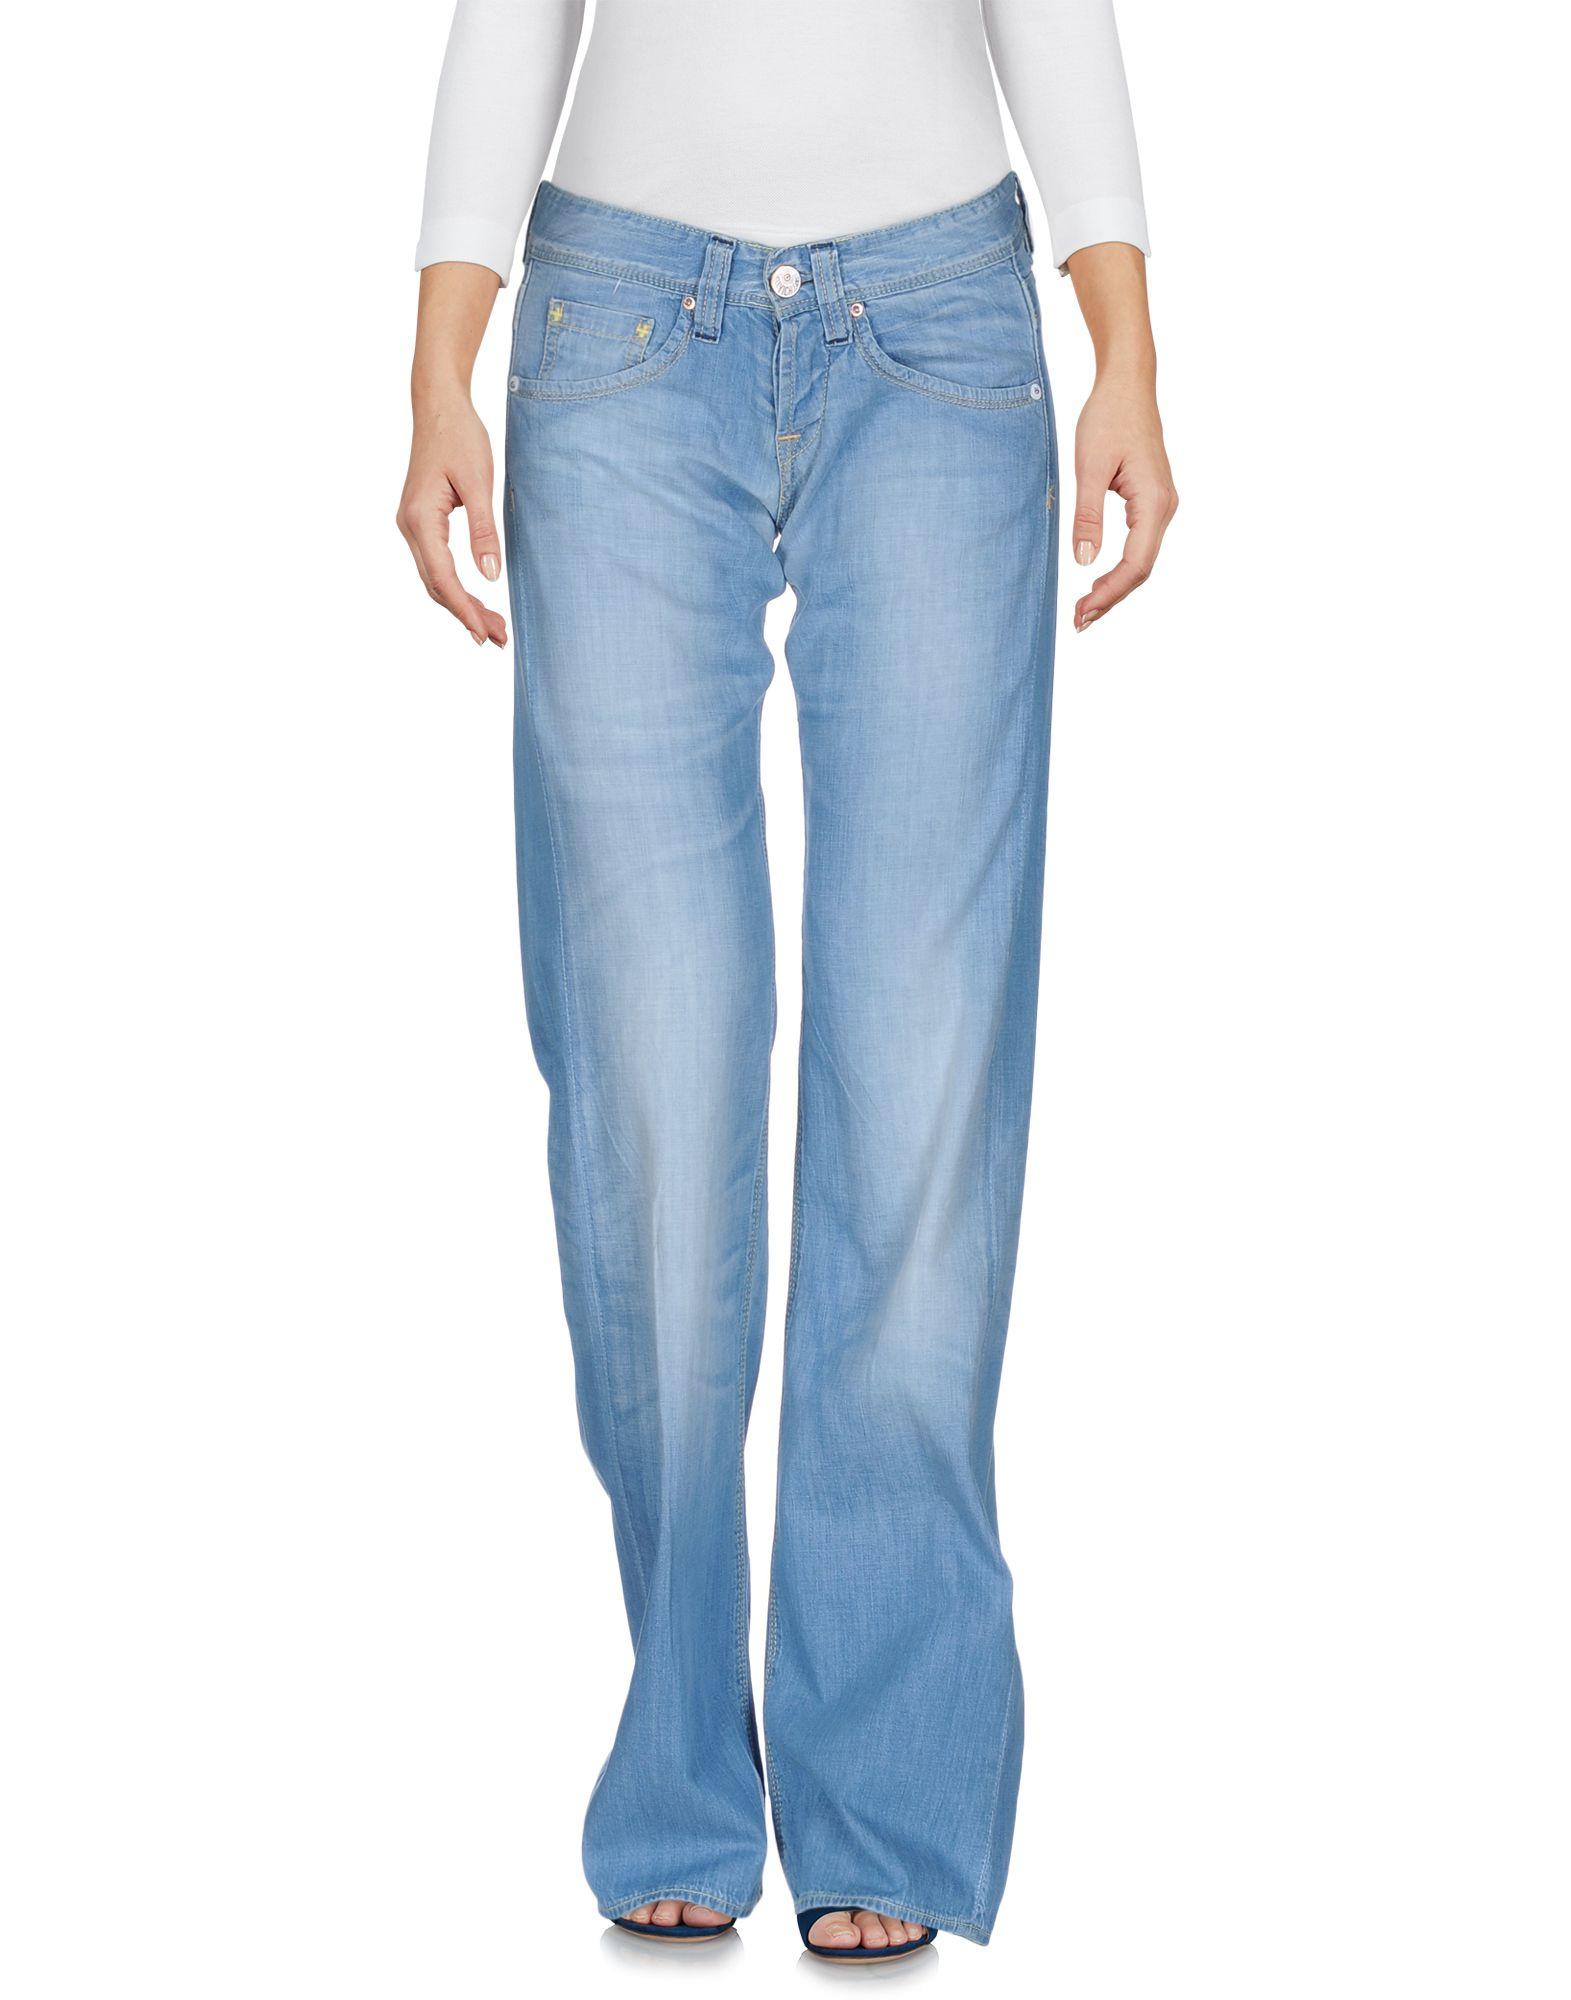 KUYICHI Damen Jeanshose Farbe Blau Größe 3